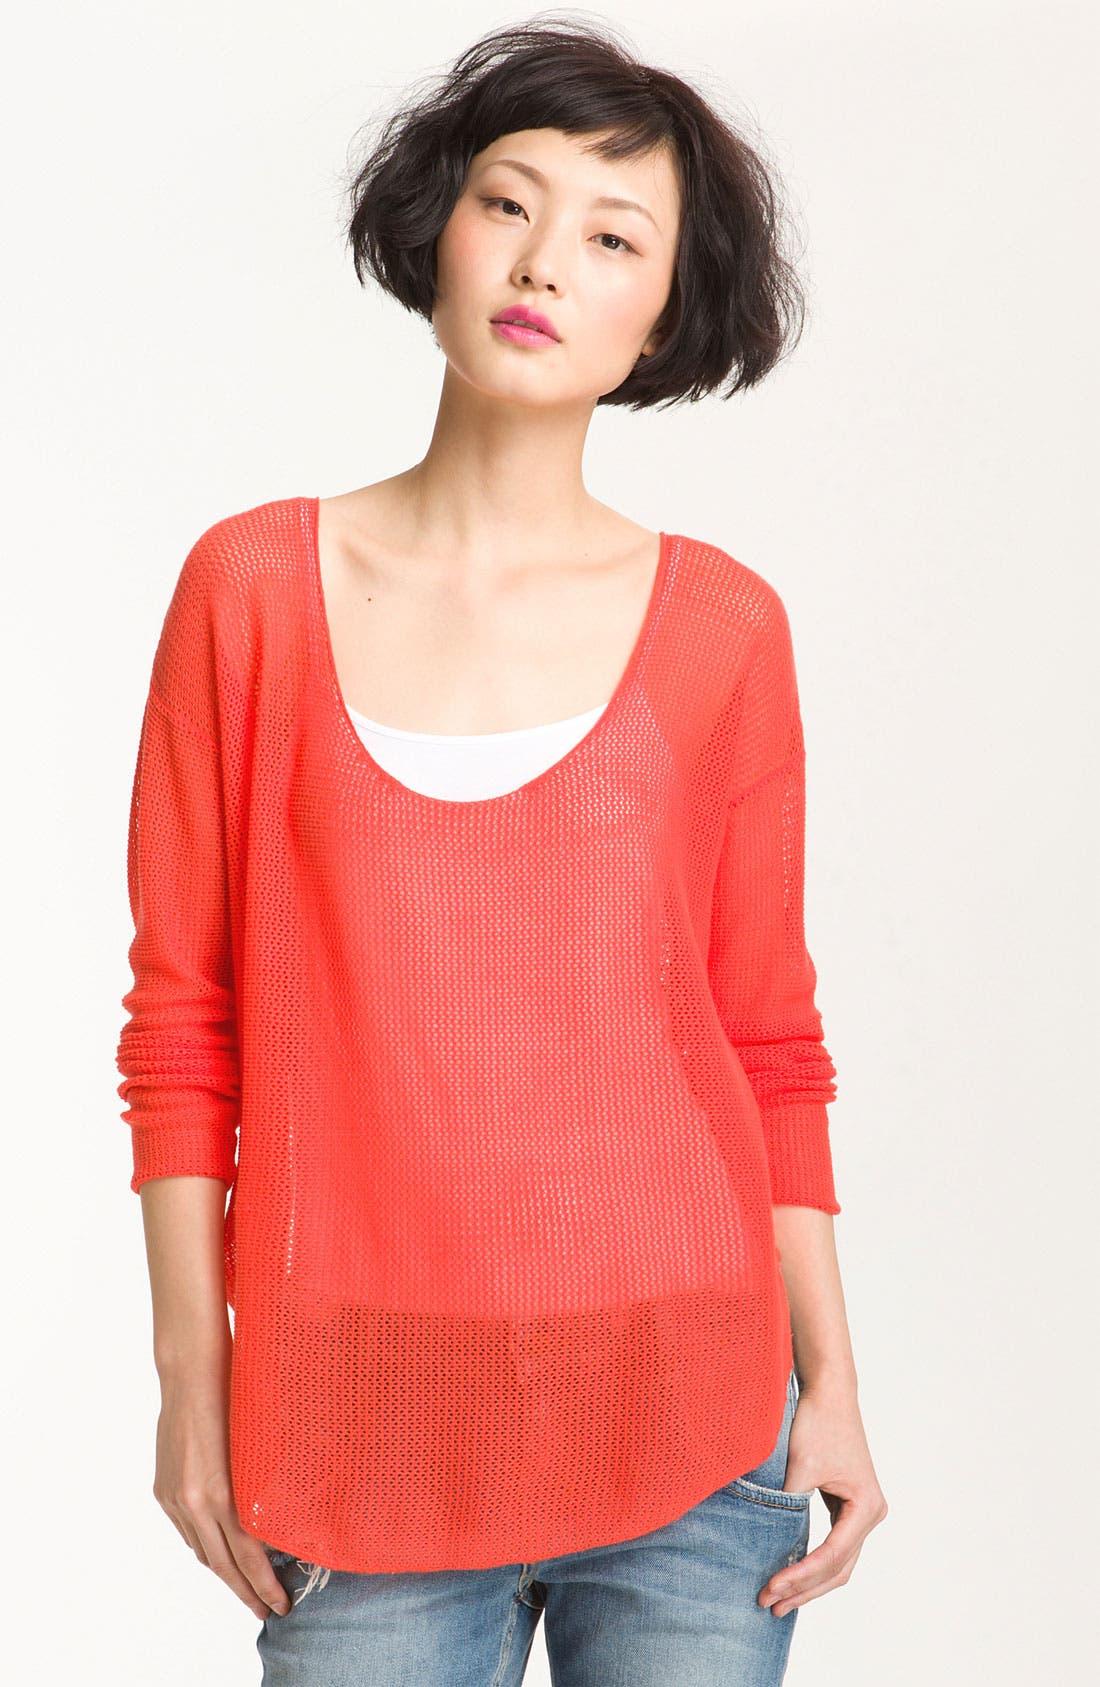 Alternate Image 1 Selected - Soft Joie 'Nia' Sheer Oversized Mesh Top